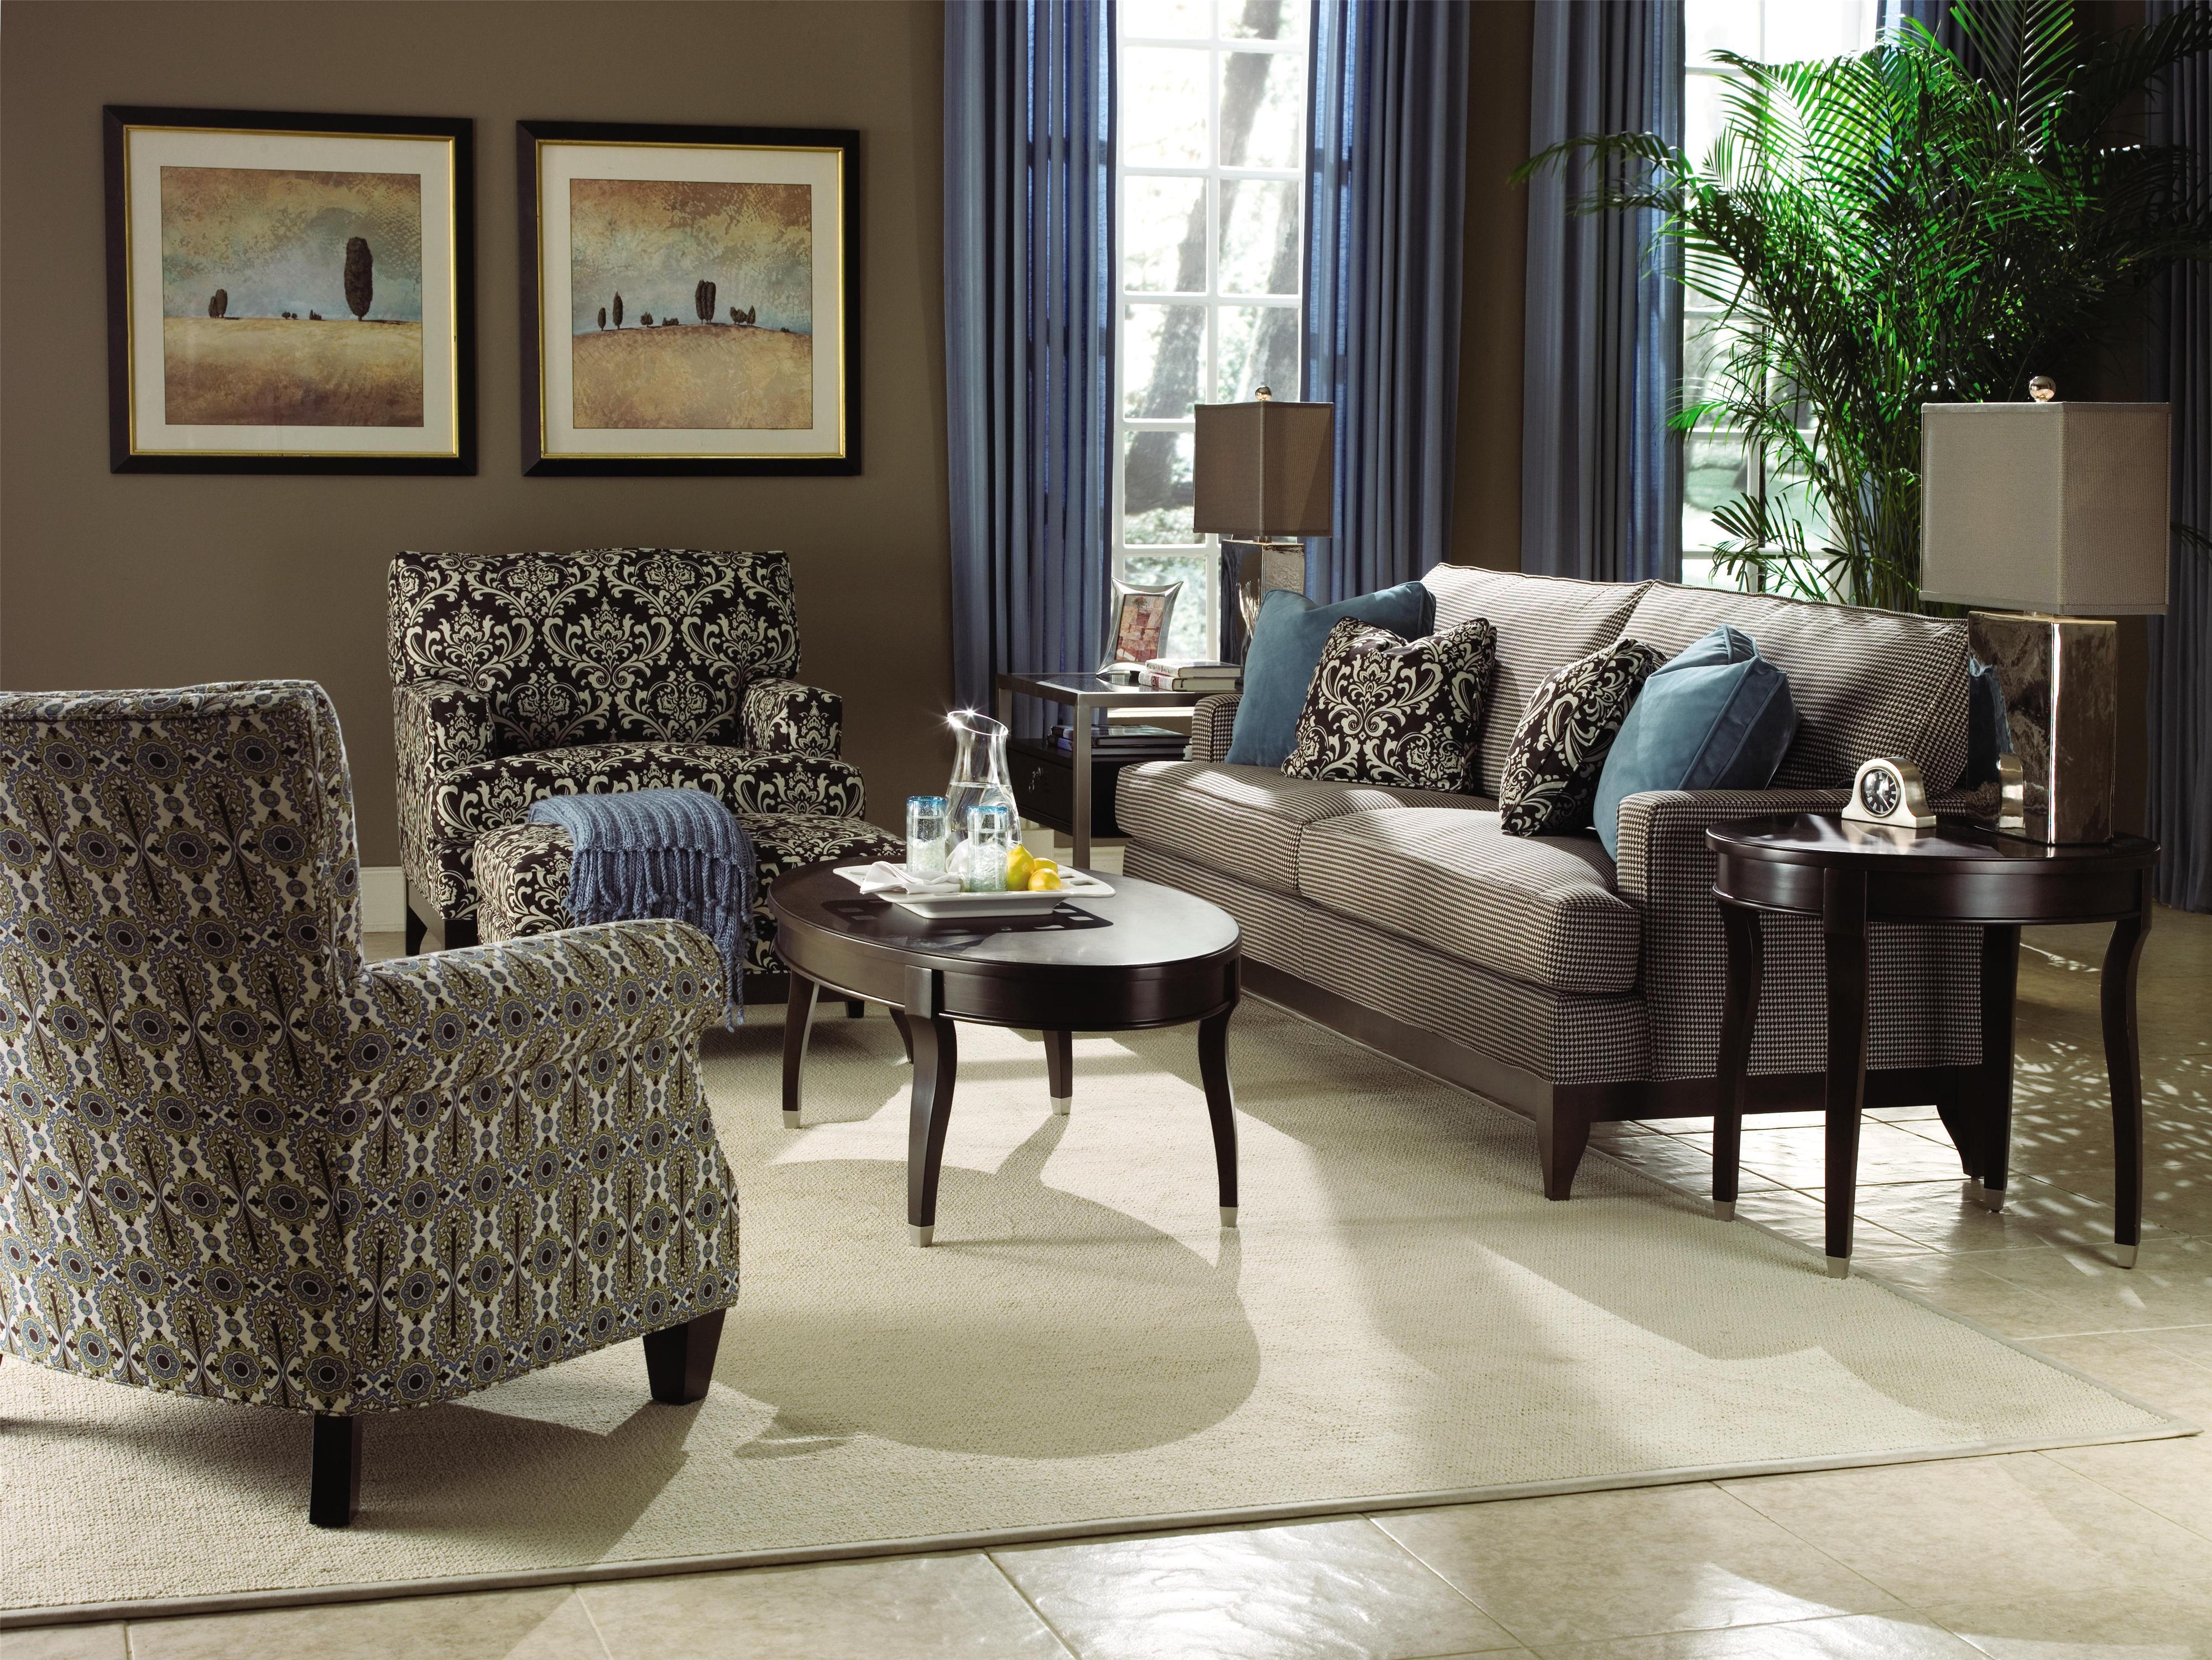 Alston 629 By Kincaid Furniture Adcock Furniture